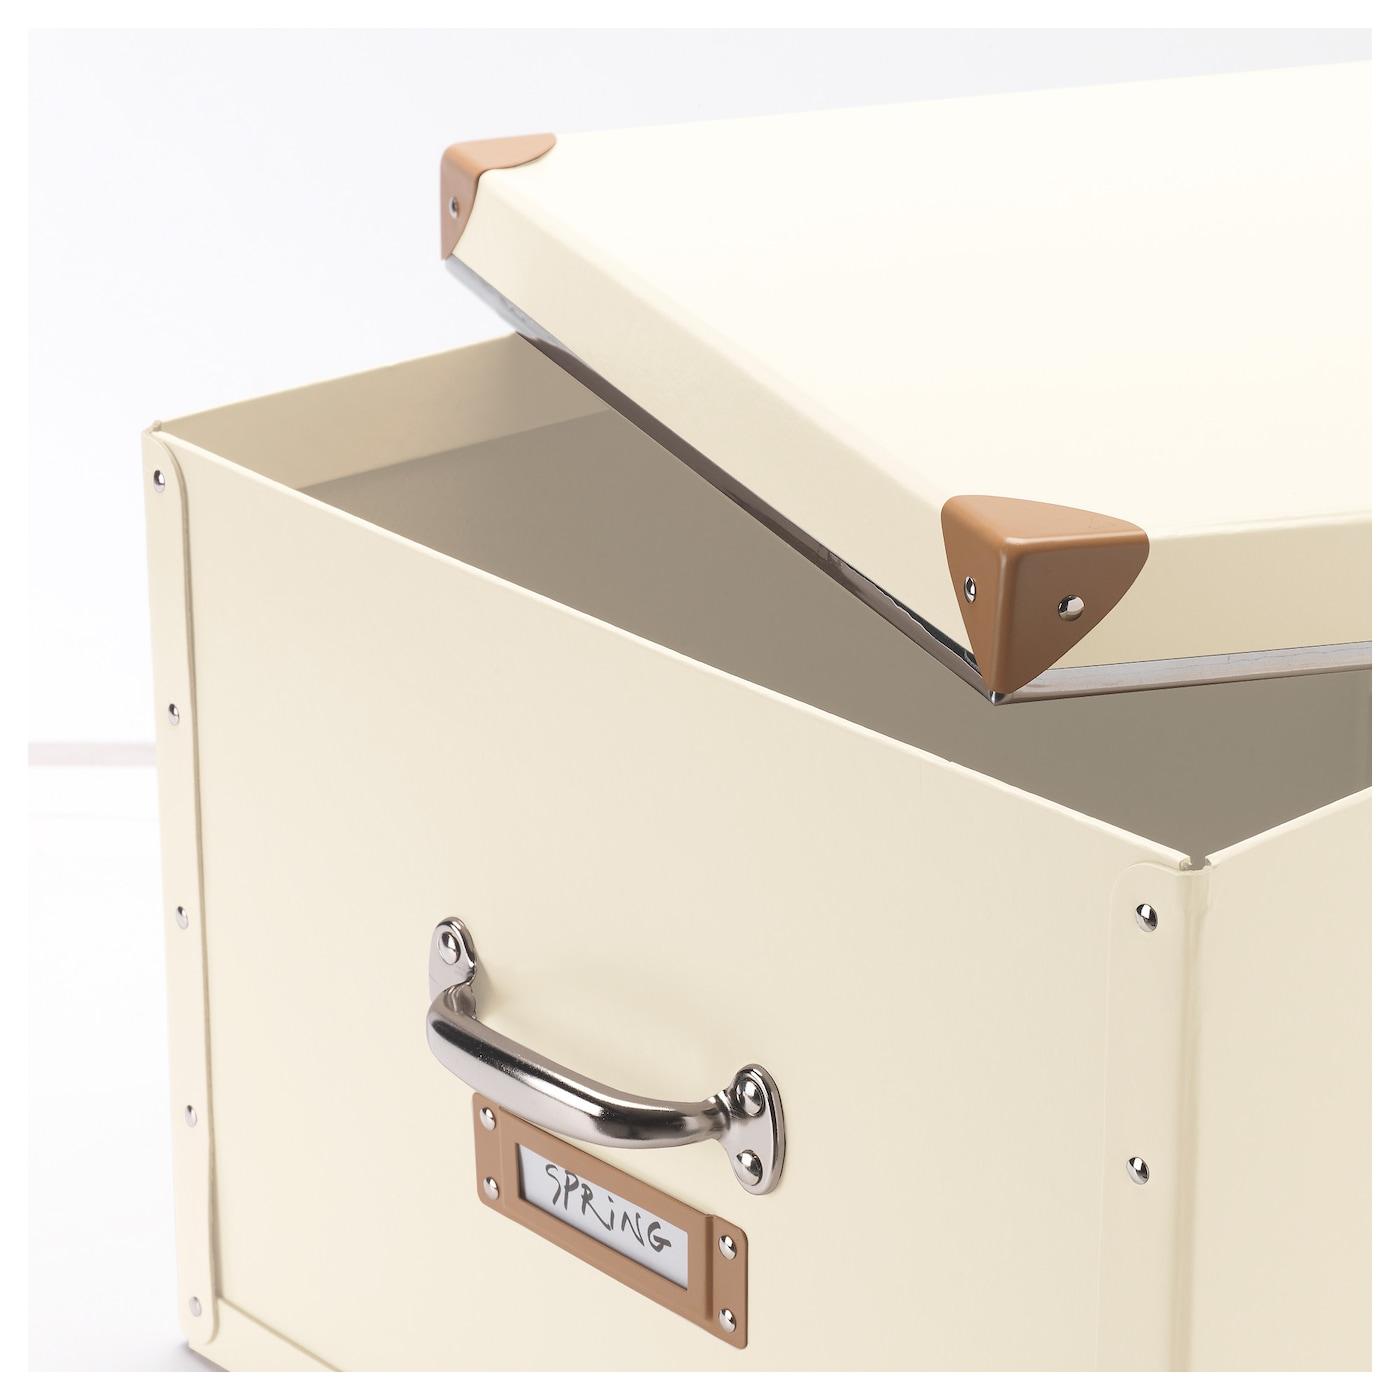 Fj Lla Box With Lid Off White 40x56x28 Cm Ikea